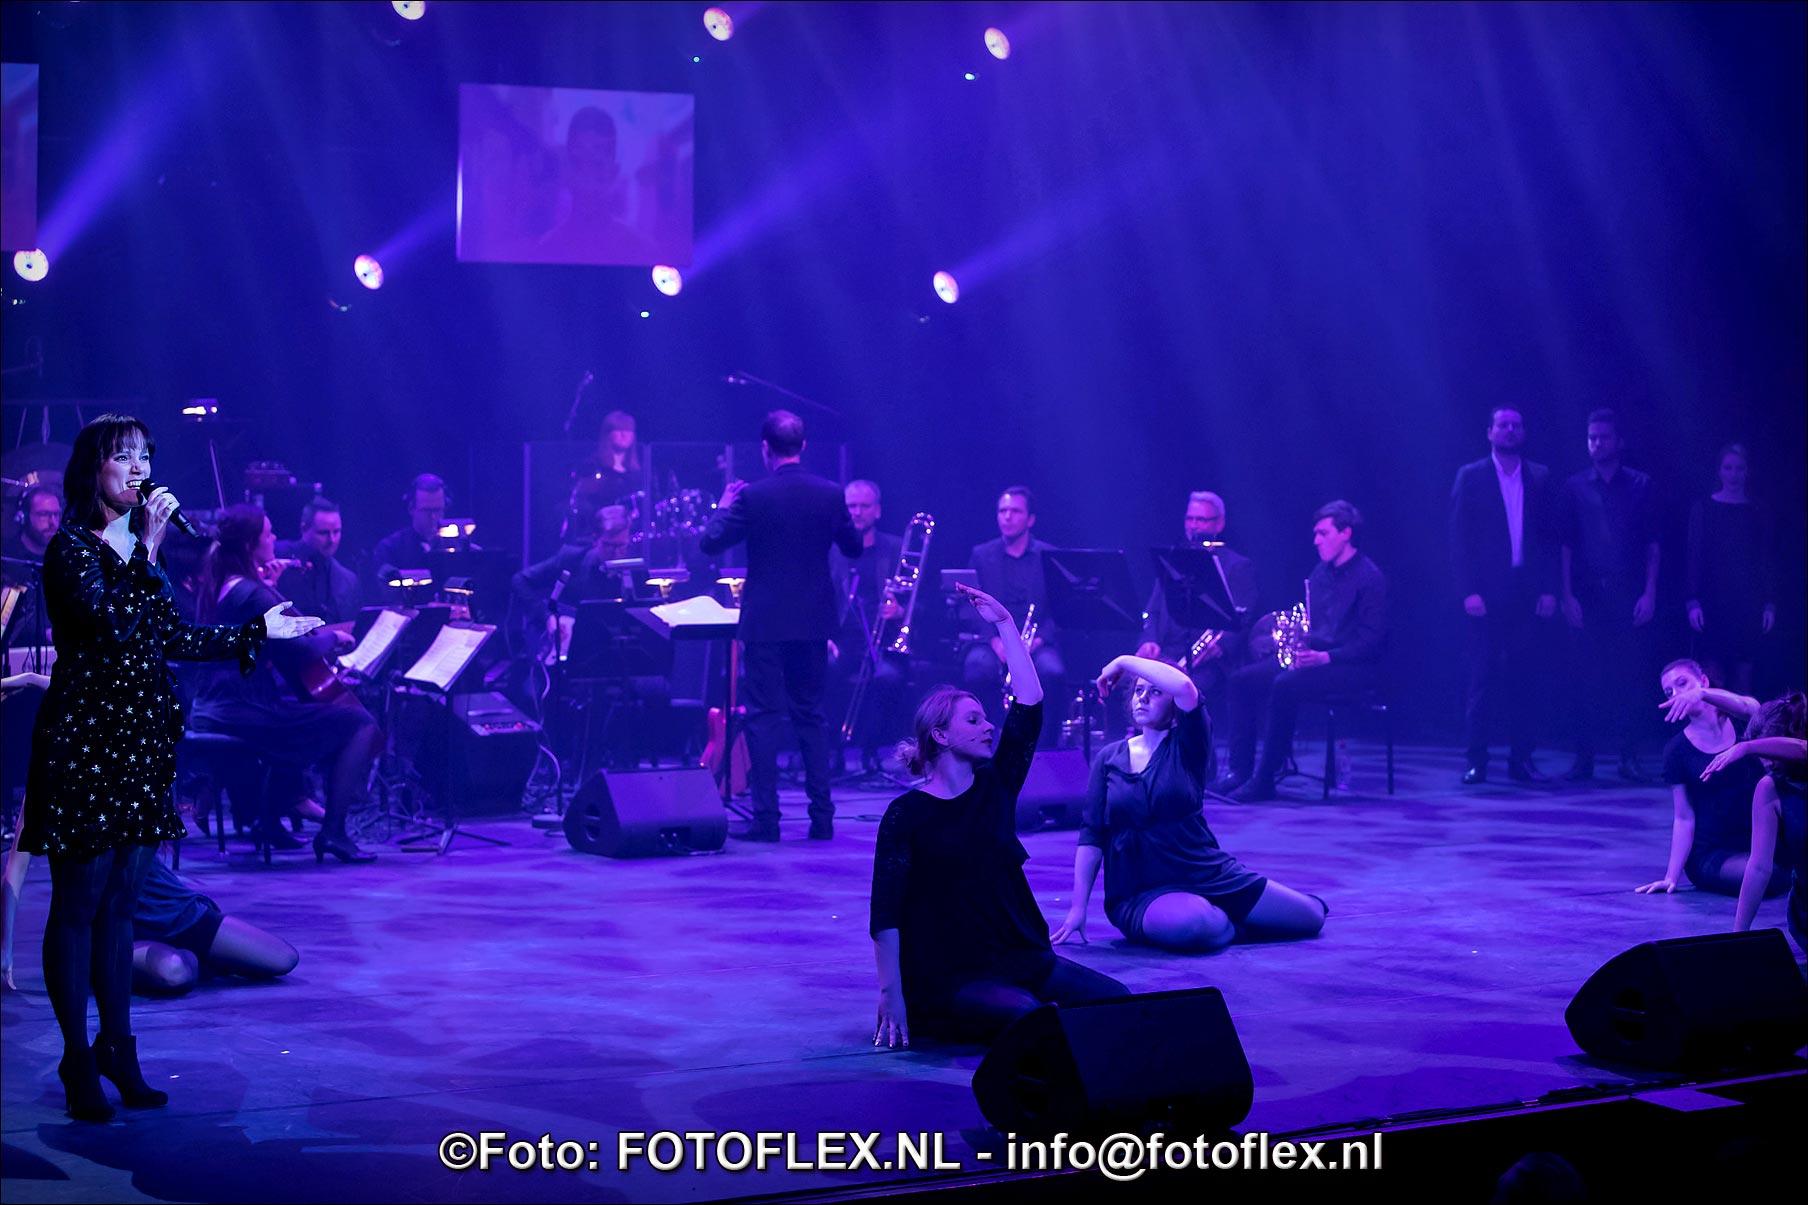 0639-CopyrightFOTOFLEX.NL07012020